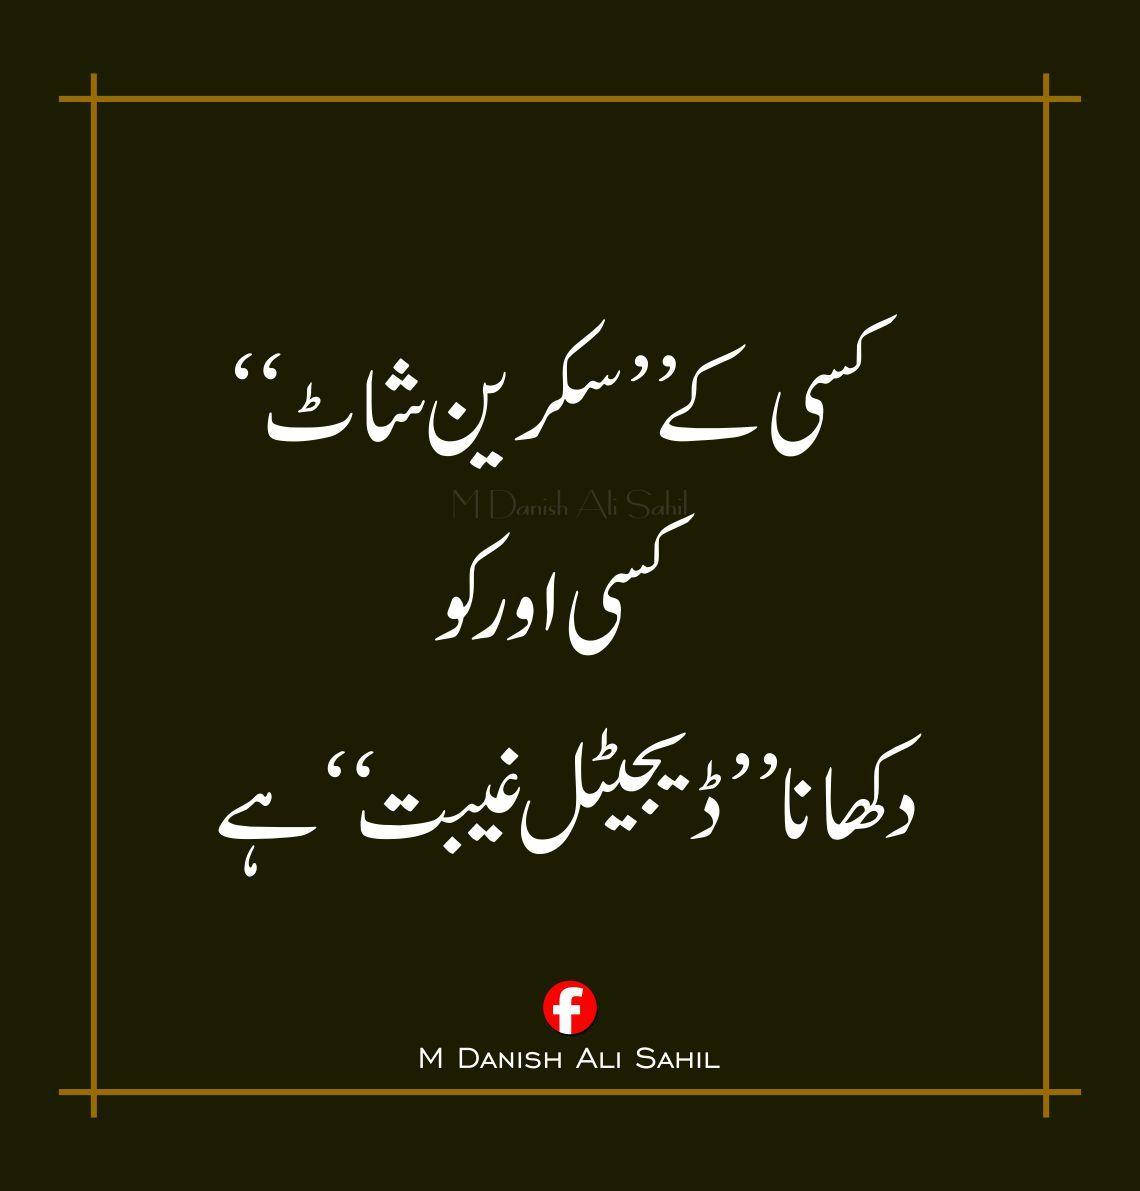 Design Islamic Urdu Quotes Quotes Images Pictures Best Collection Zindagi About Life Best U Funny Quotes In Urdu Urdu Funny Quotes Super Funny Quotes